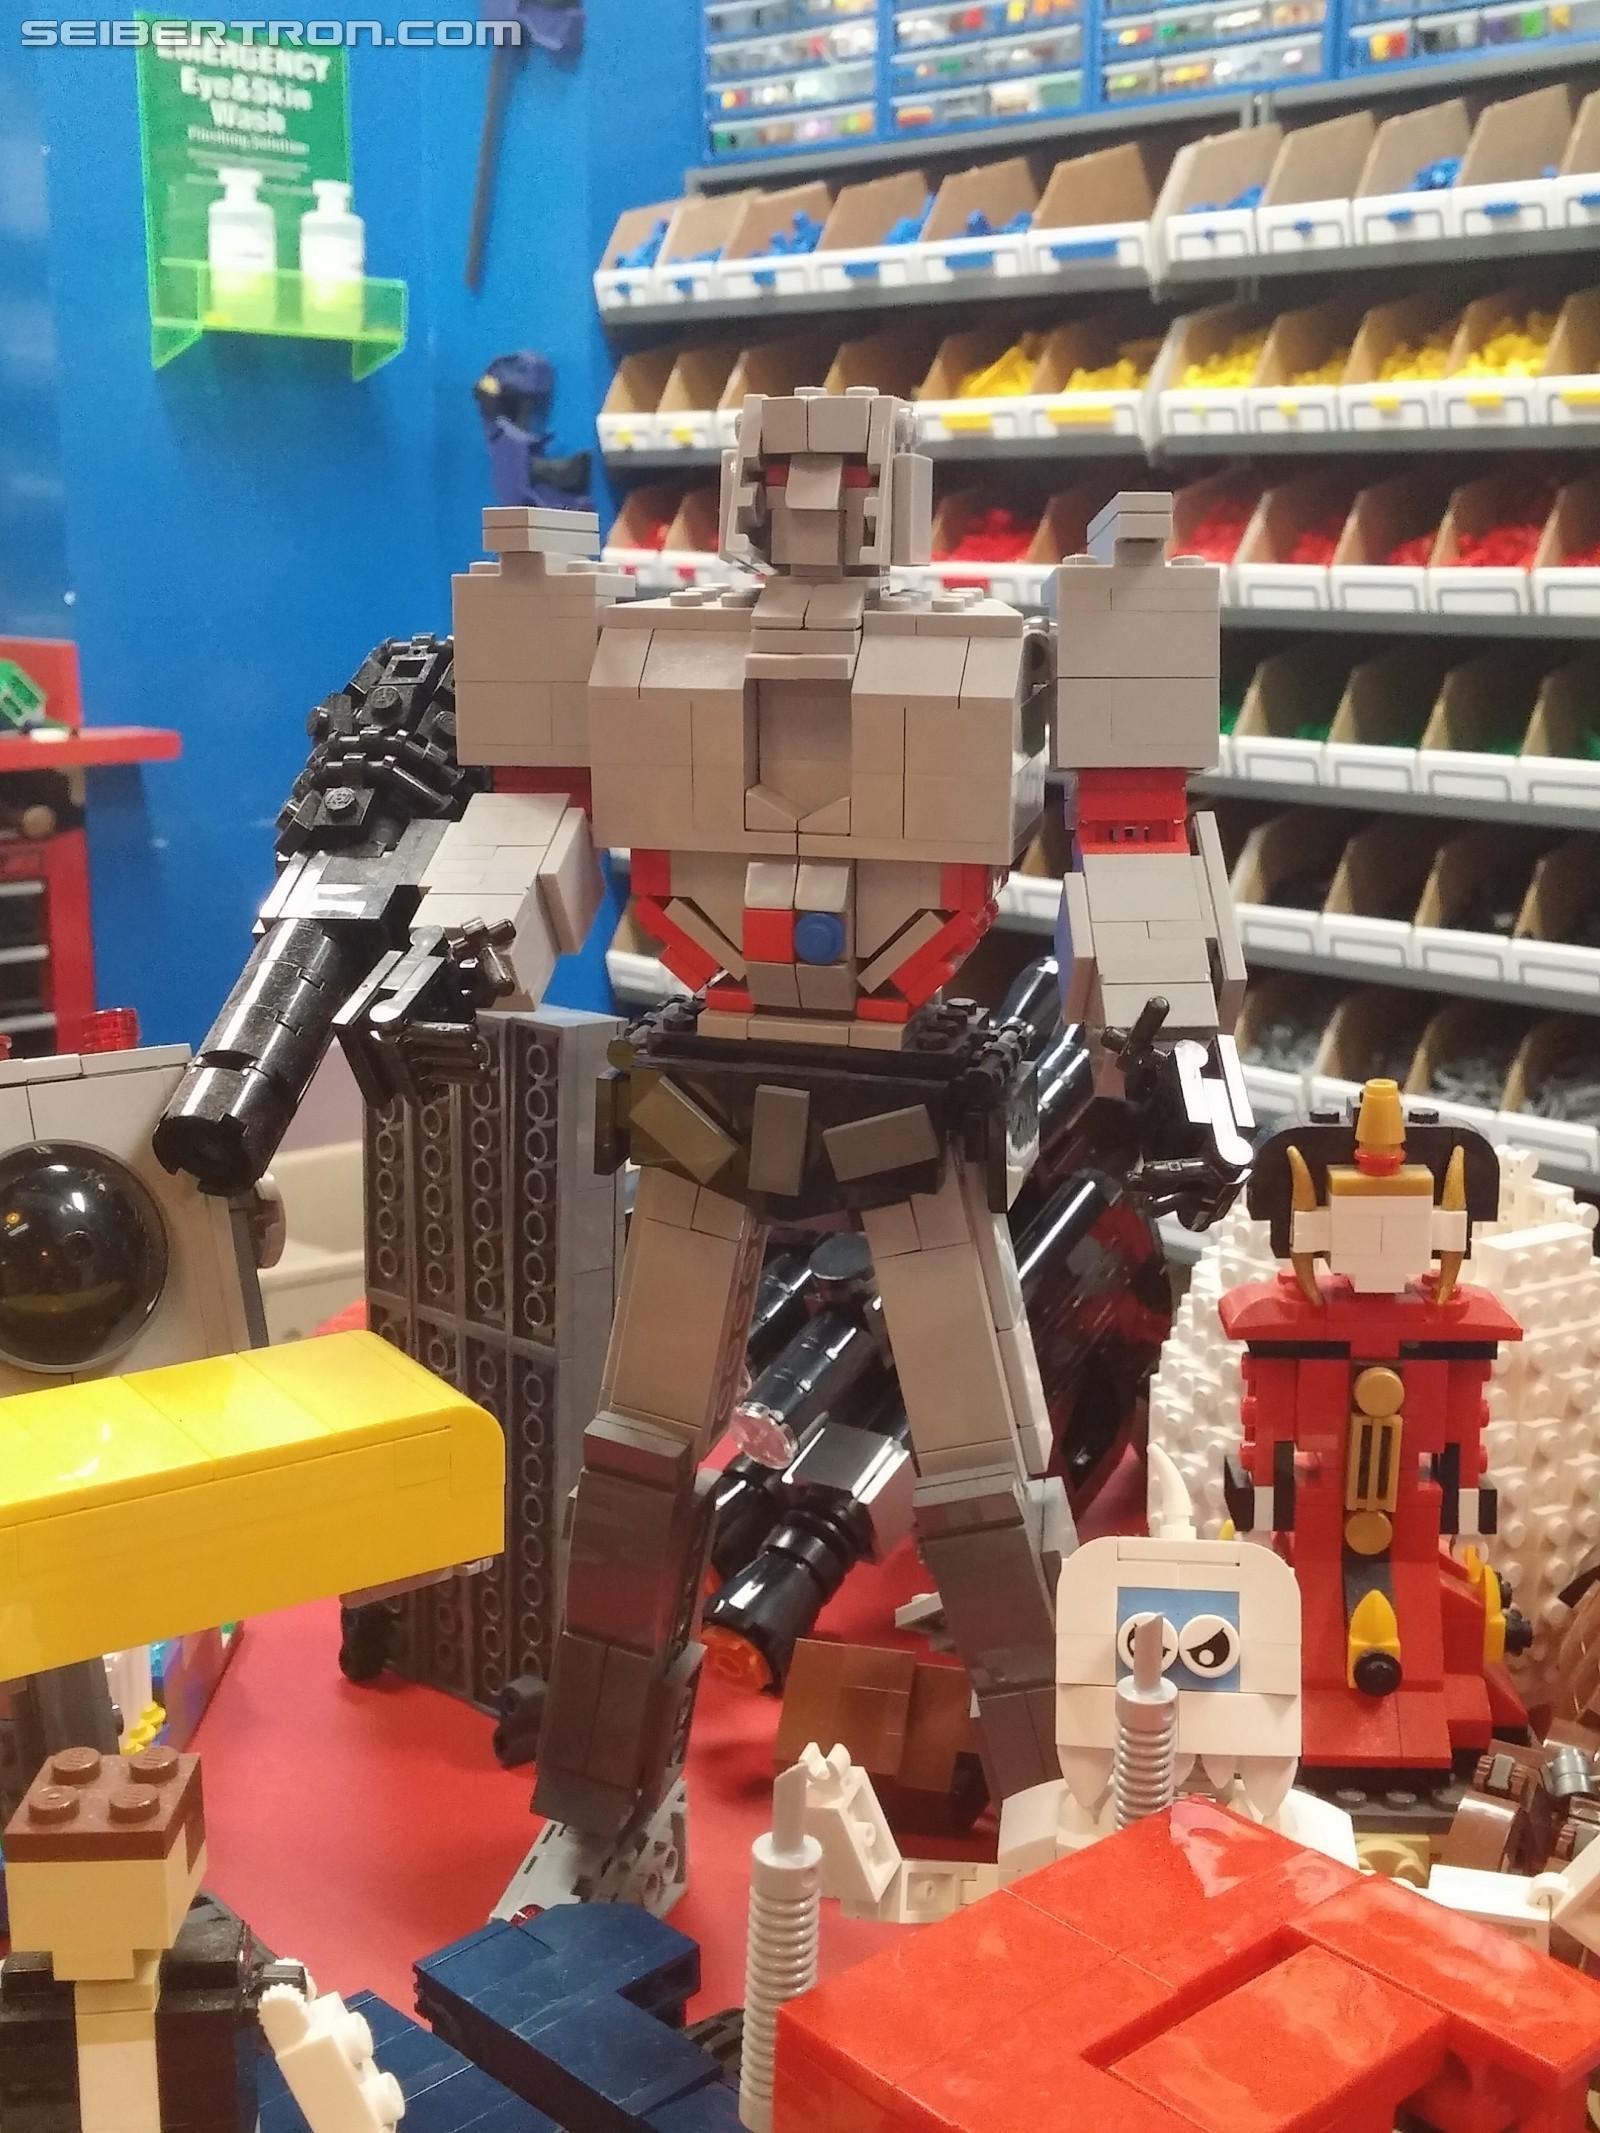 unofficial lego transformers models at legoland discovery center kansas city. Black Bedroom Furniture Sets. Home Design Ideas